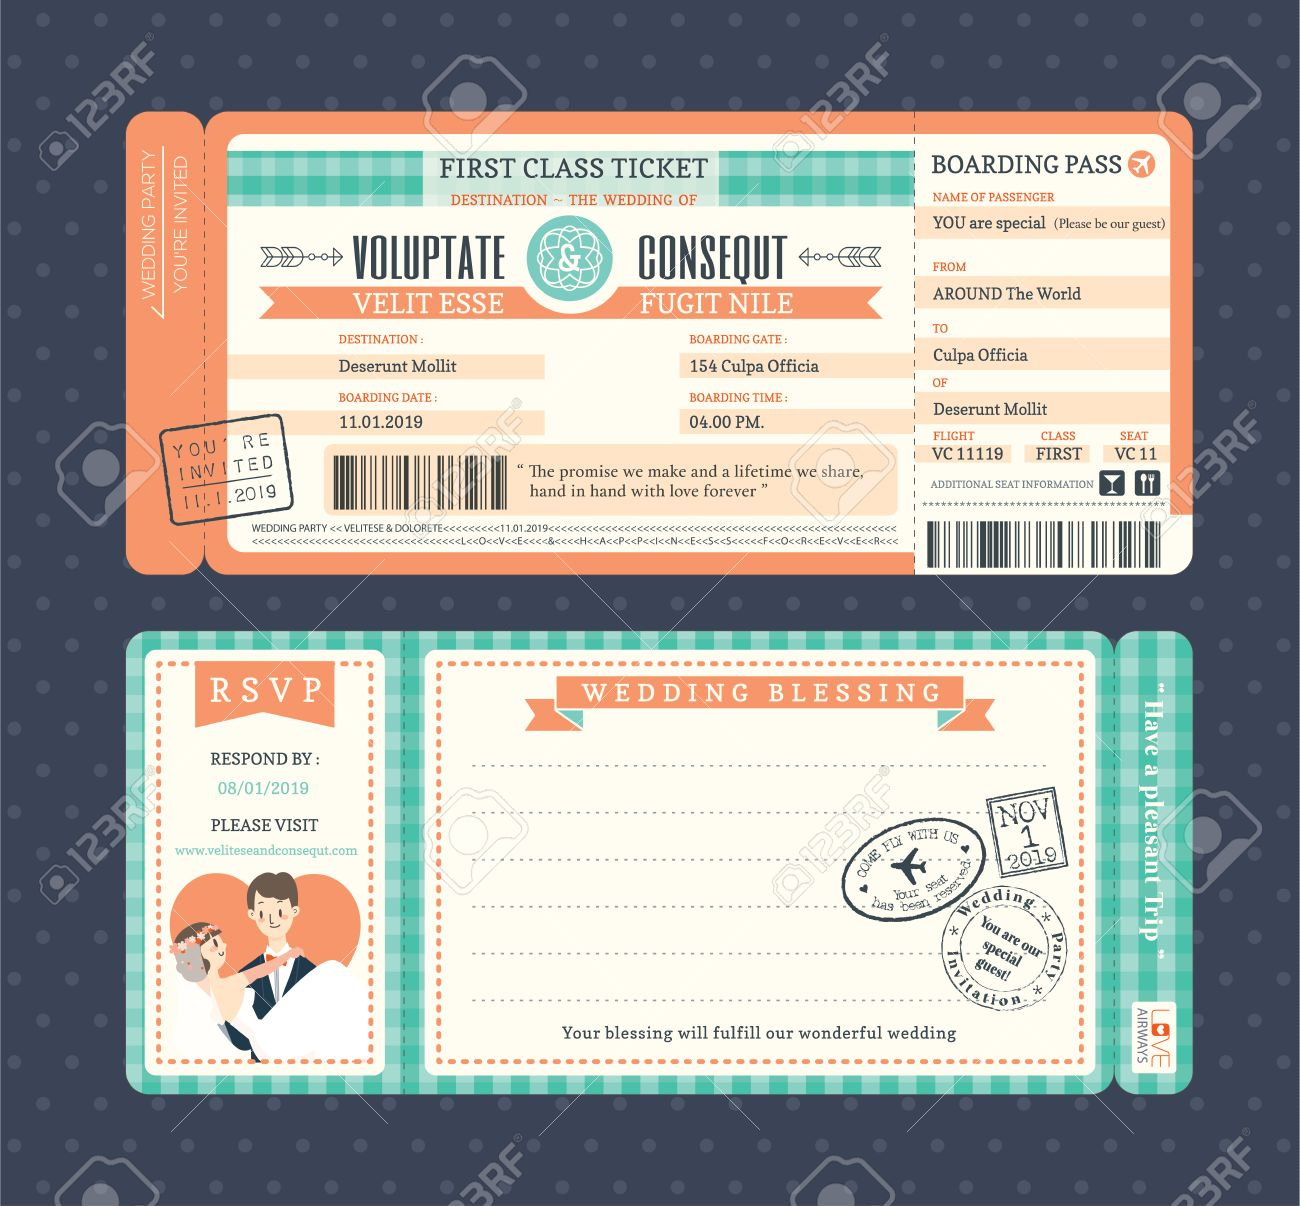 Pastel Retro Boarding Pass Ticket Wedding Invitation Template ...